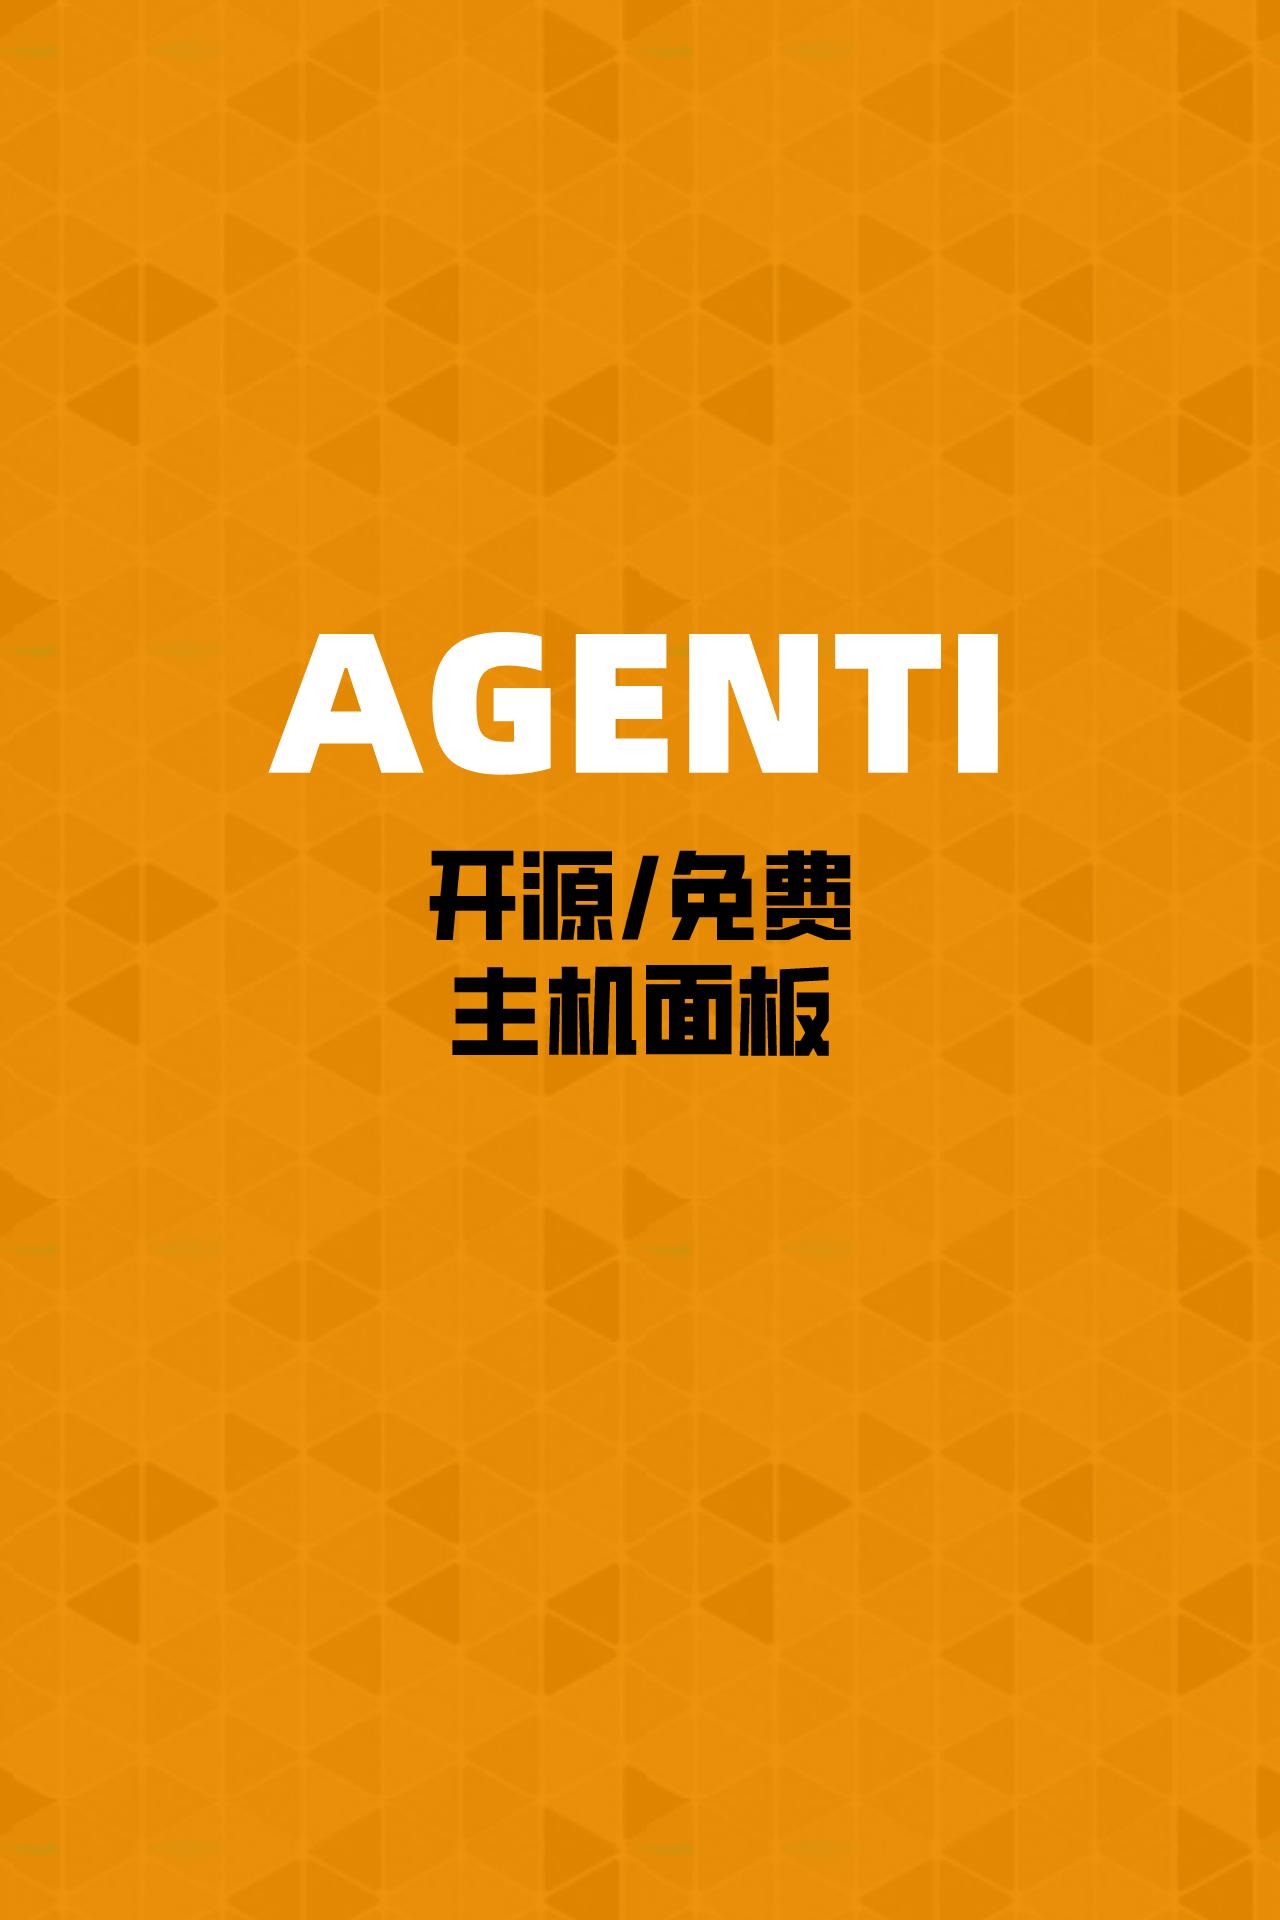 Ajenti-开源/免费的主机管理面板